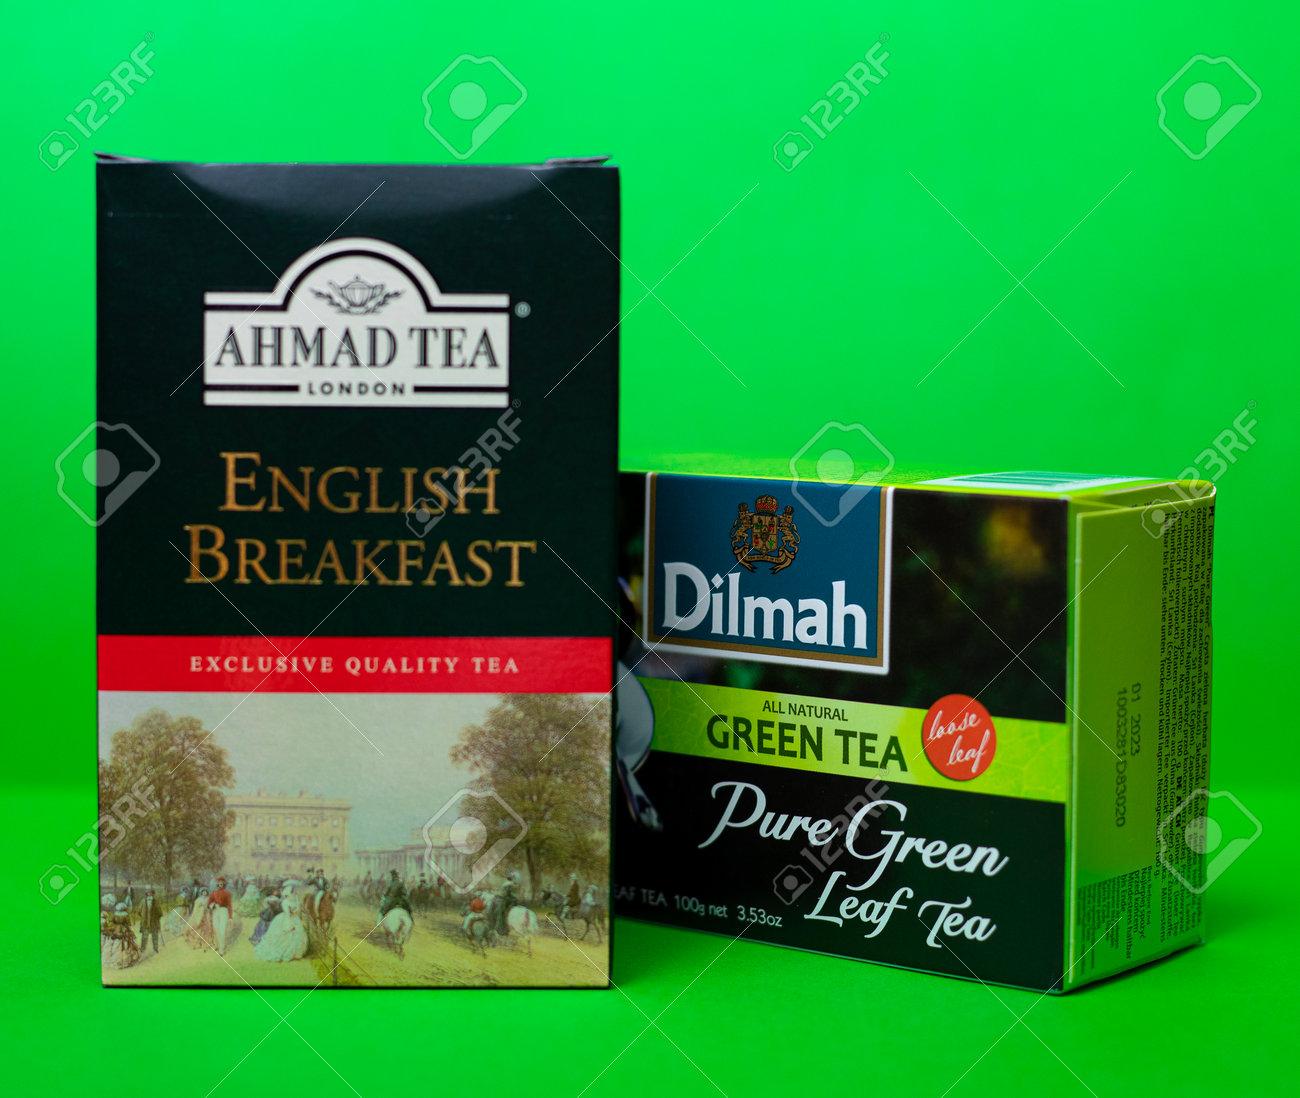 Dilmah and Ahmad tea. Natural pure green and black leaf tea. 01/06/2021. Warsaw, Poland - 162098056